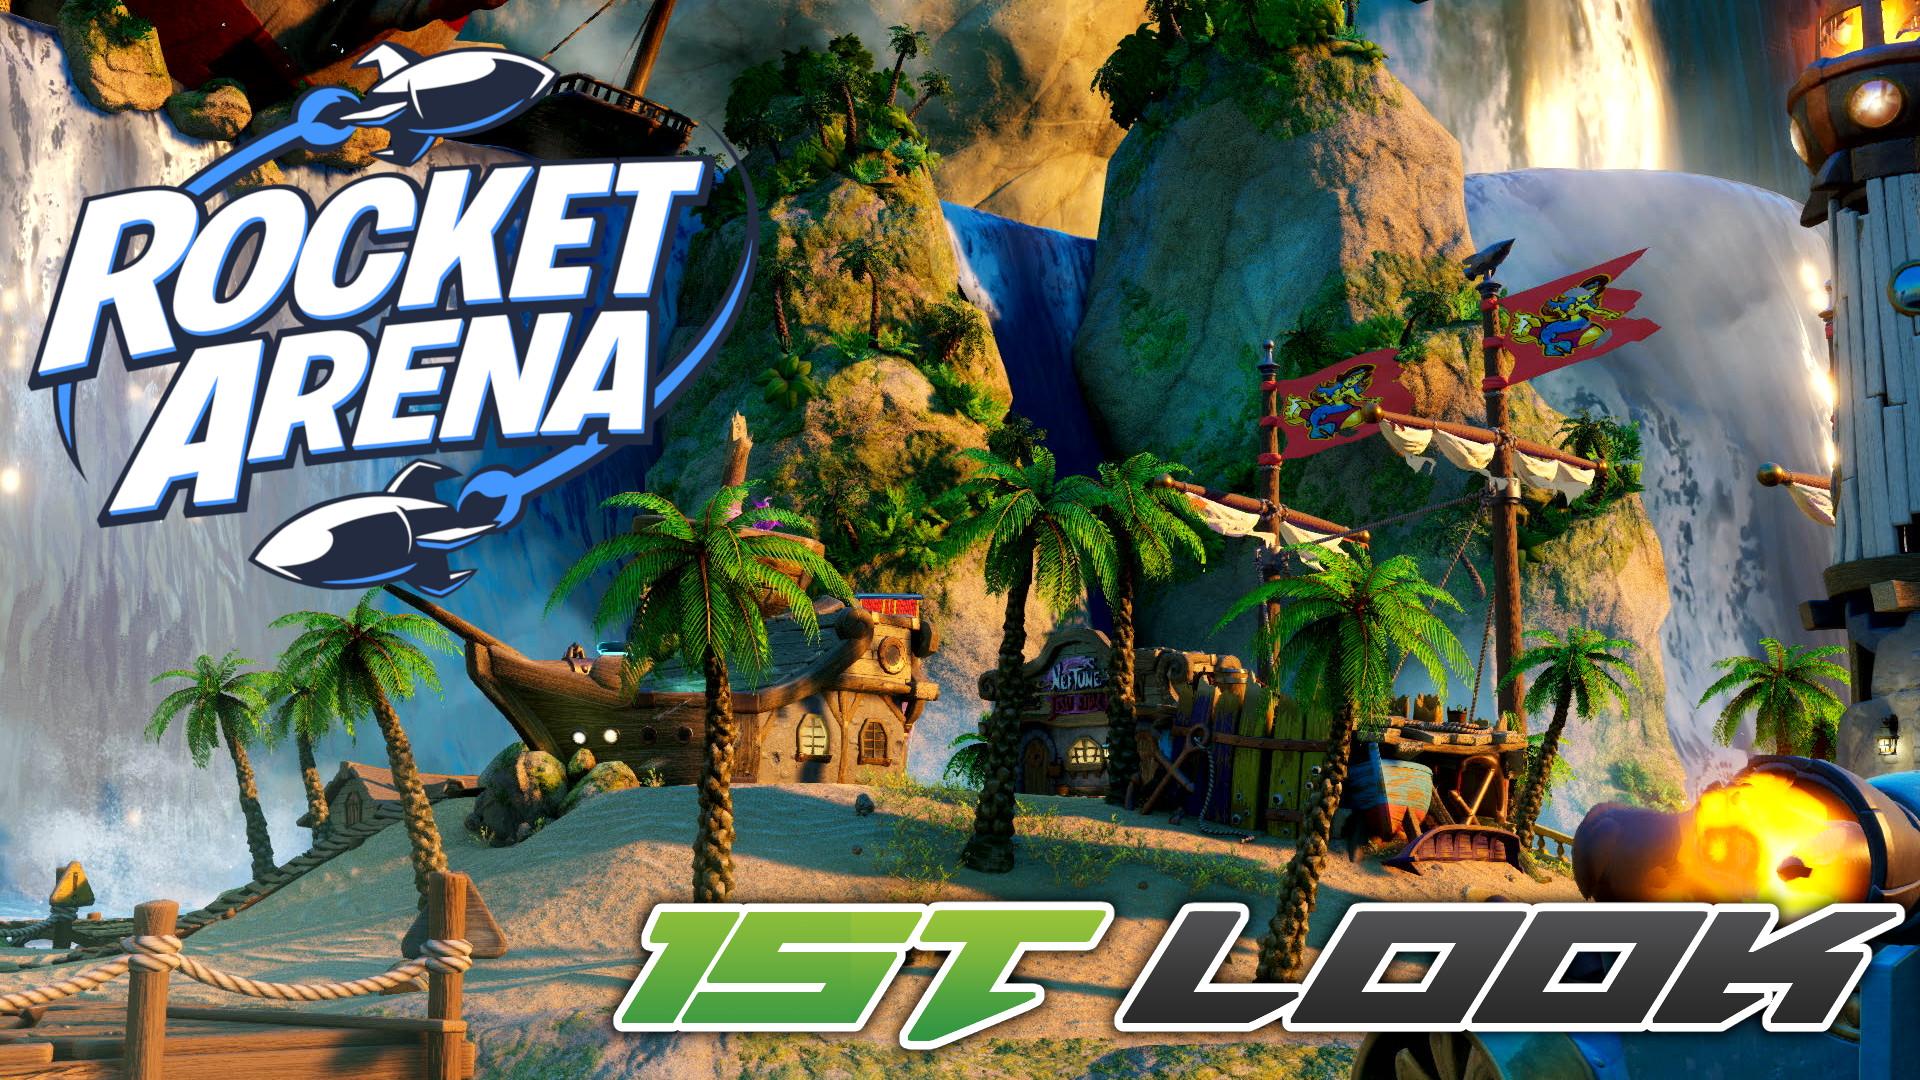 Rocket Arena First Look Thumbnail